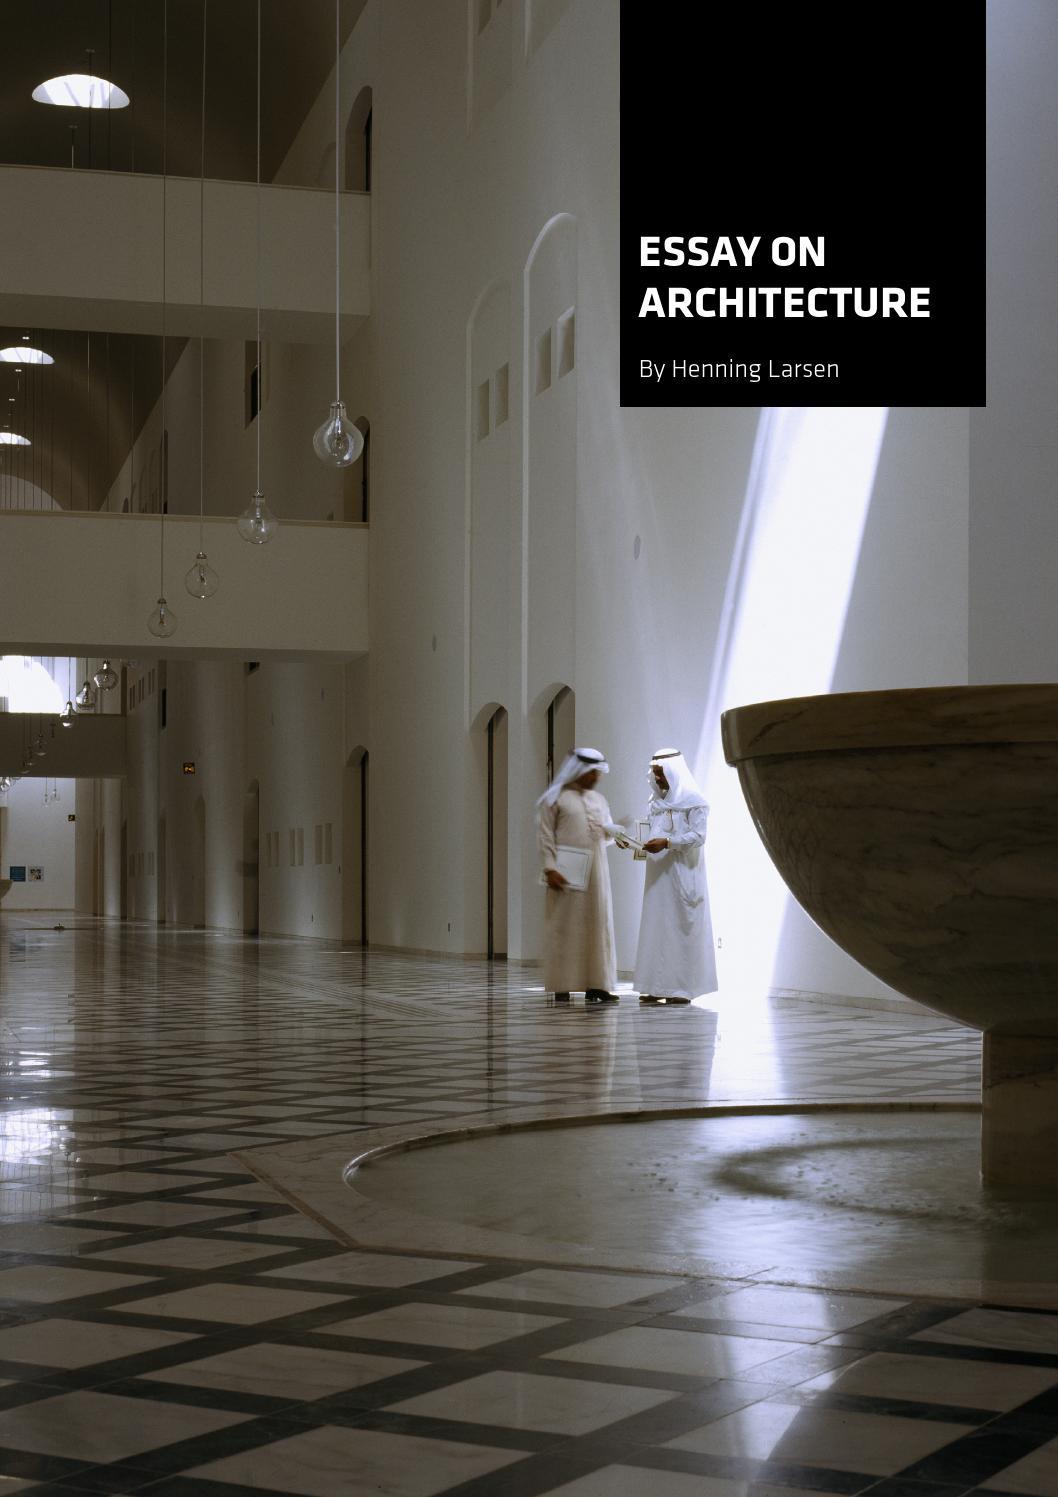 essay on architecture by henning larsen architects